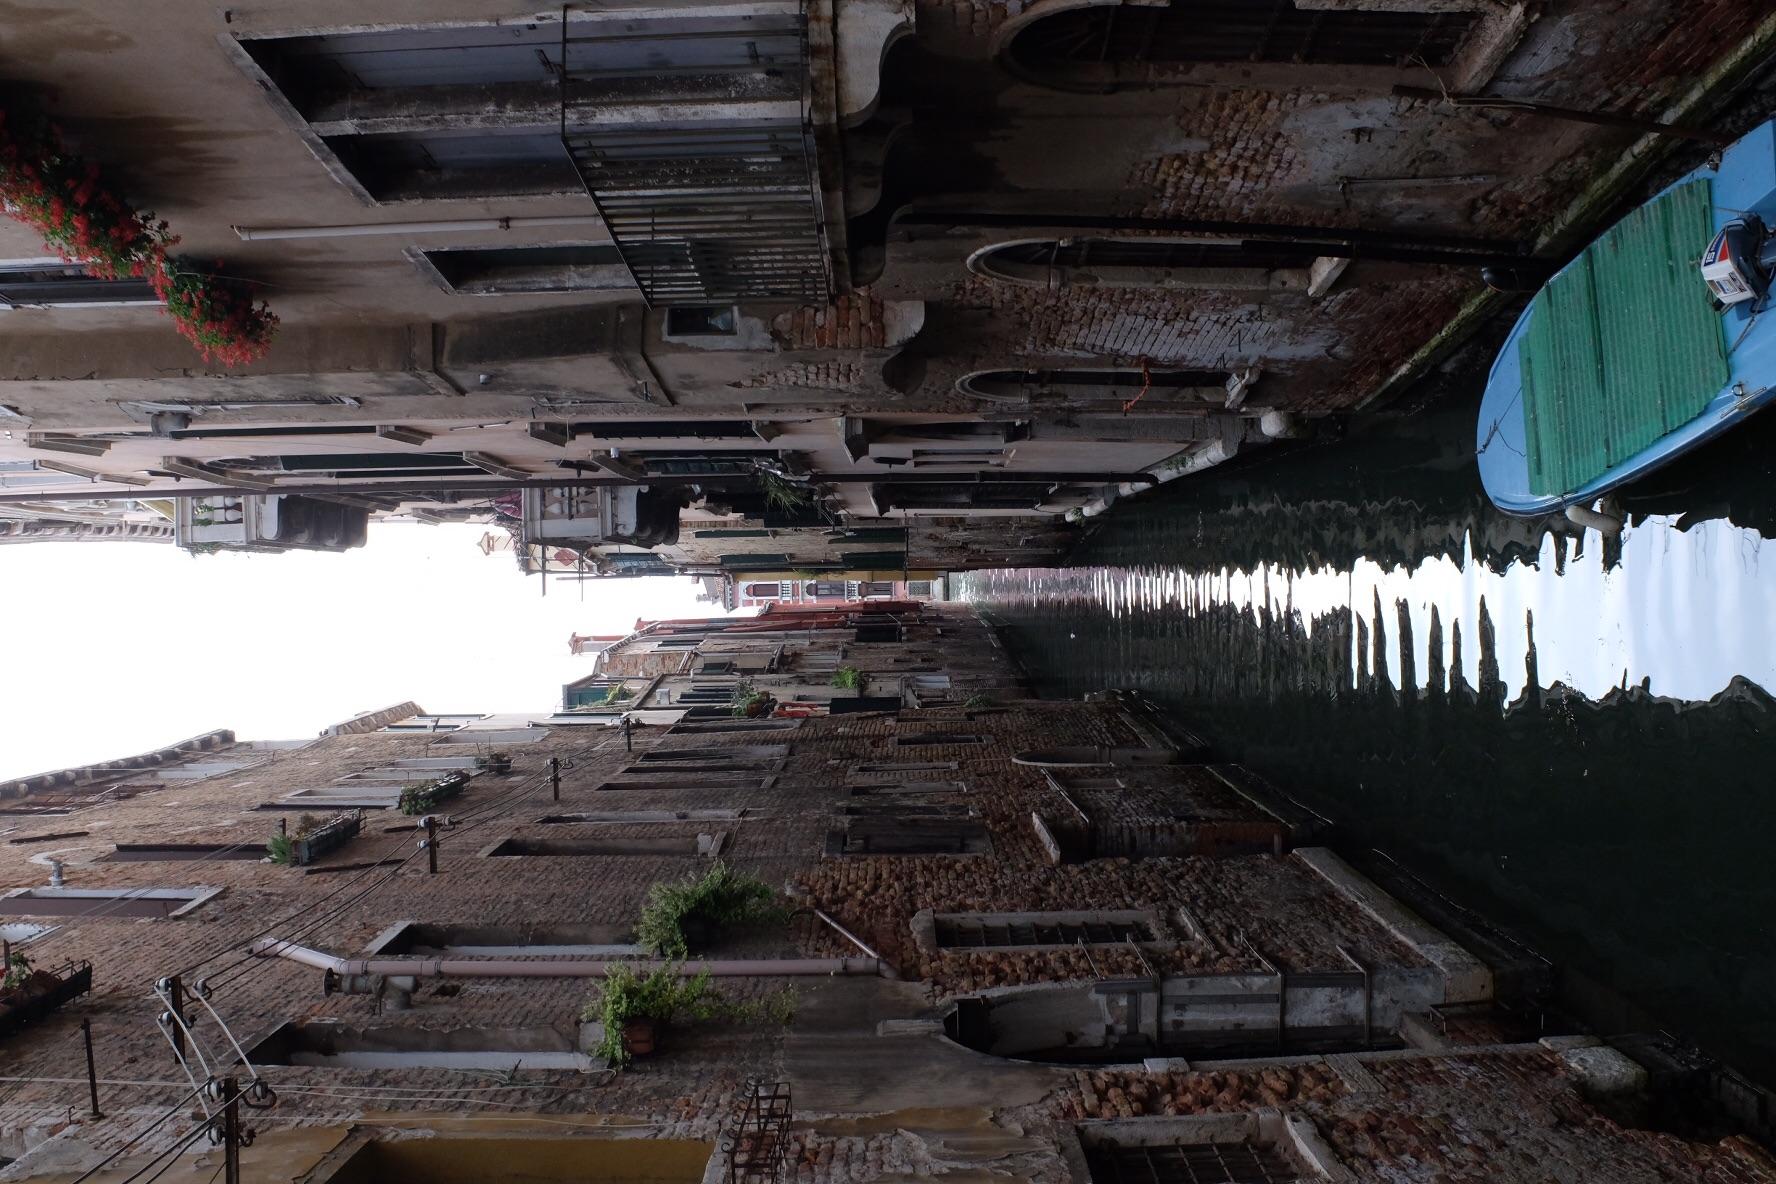 Typical mini canal scene